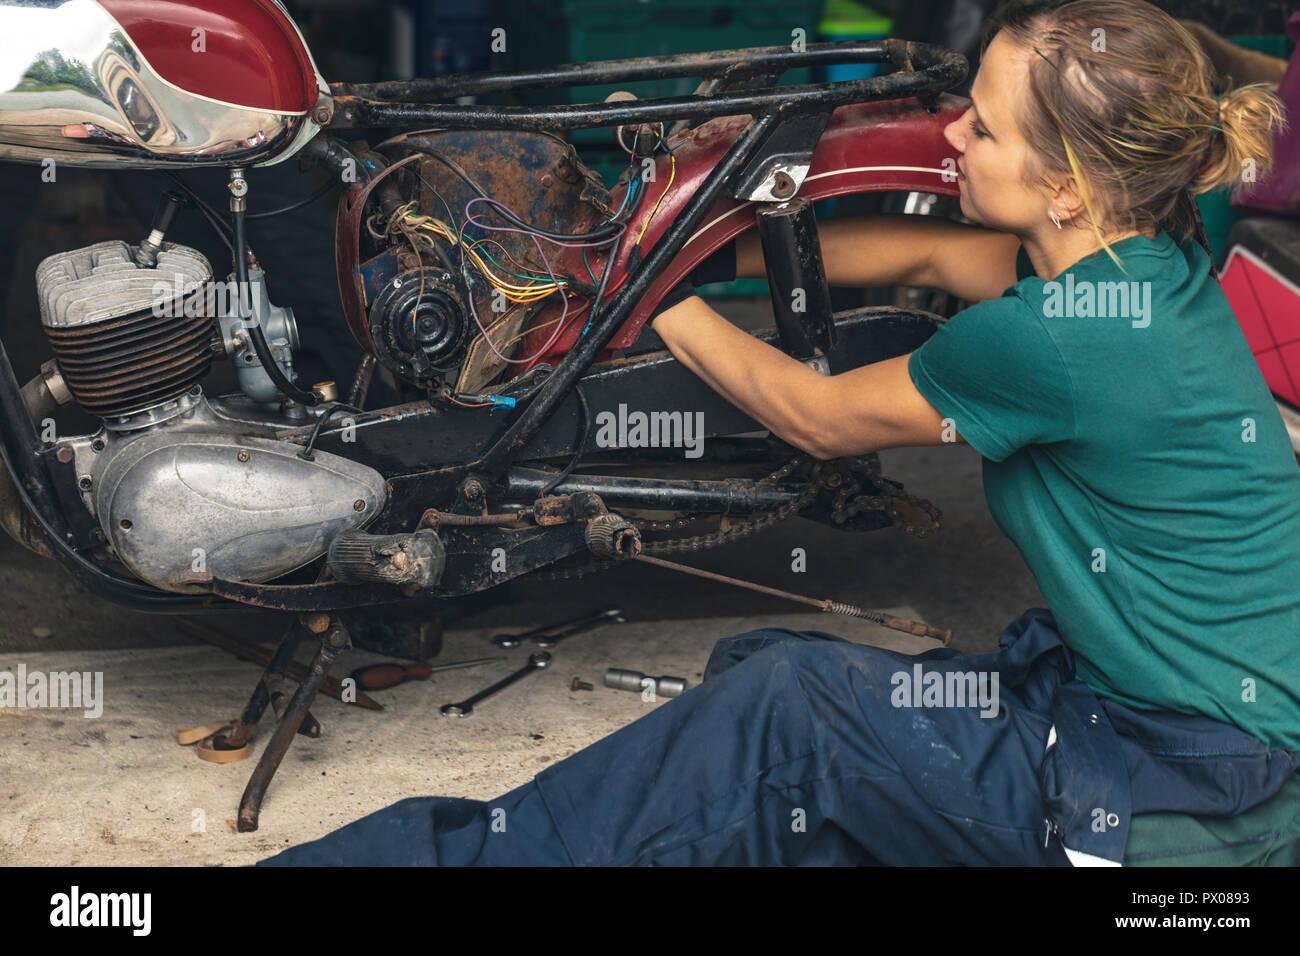 Reparación mecánica femenina moto en garaje Foto de stock